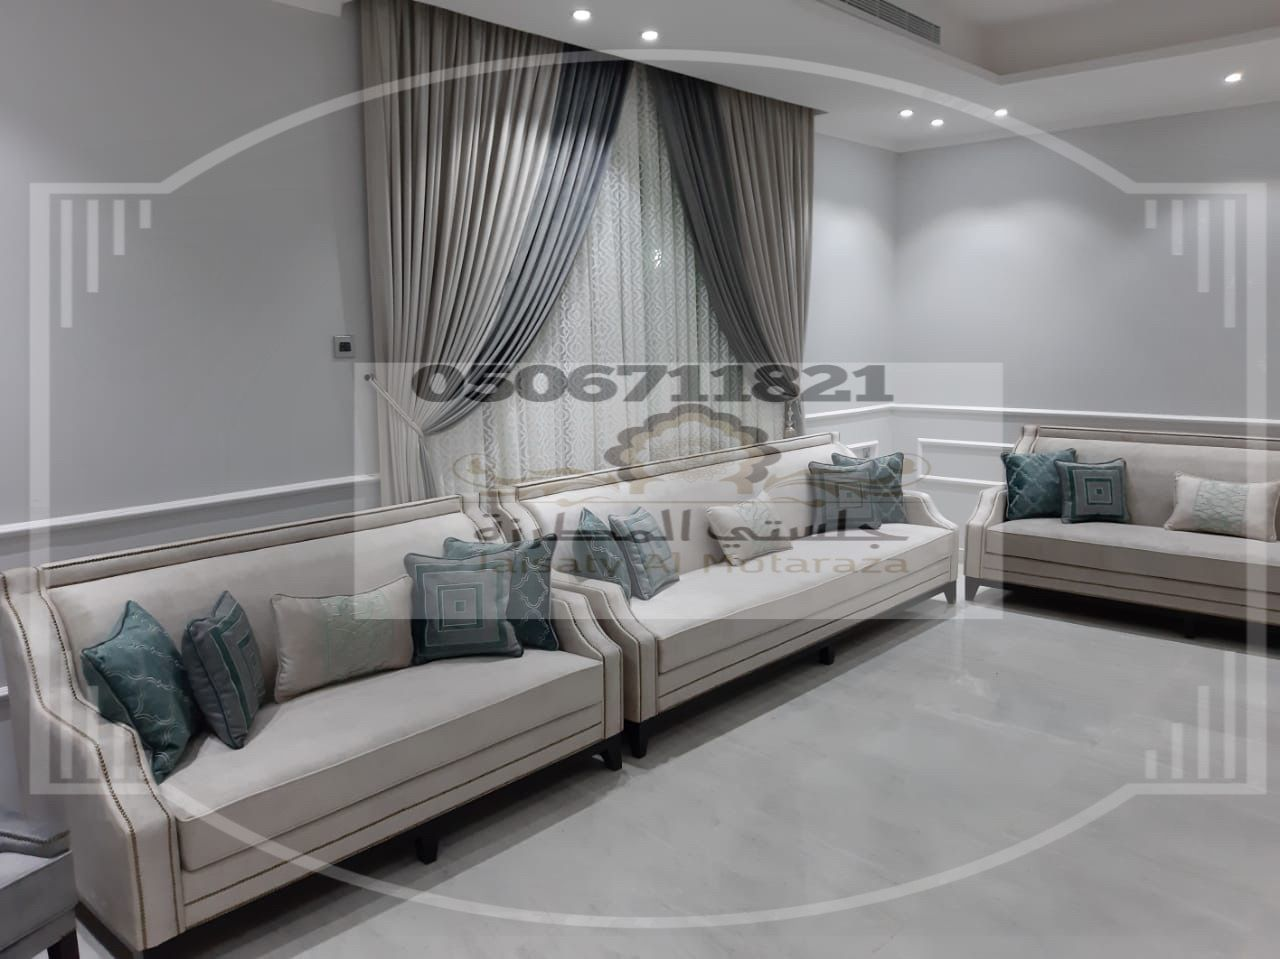 كنب مودرن روعة من تصميم وتنفيذ جلستي المطرزة جوال 0506711821 Living Room Design Decor Living Room Decor Apartment Living Room Designs